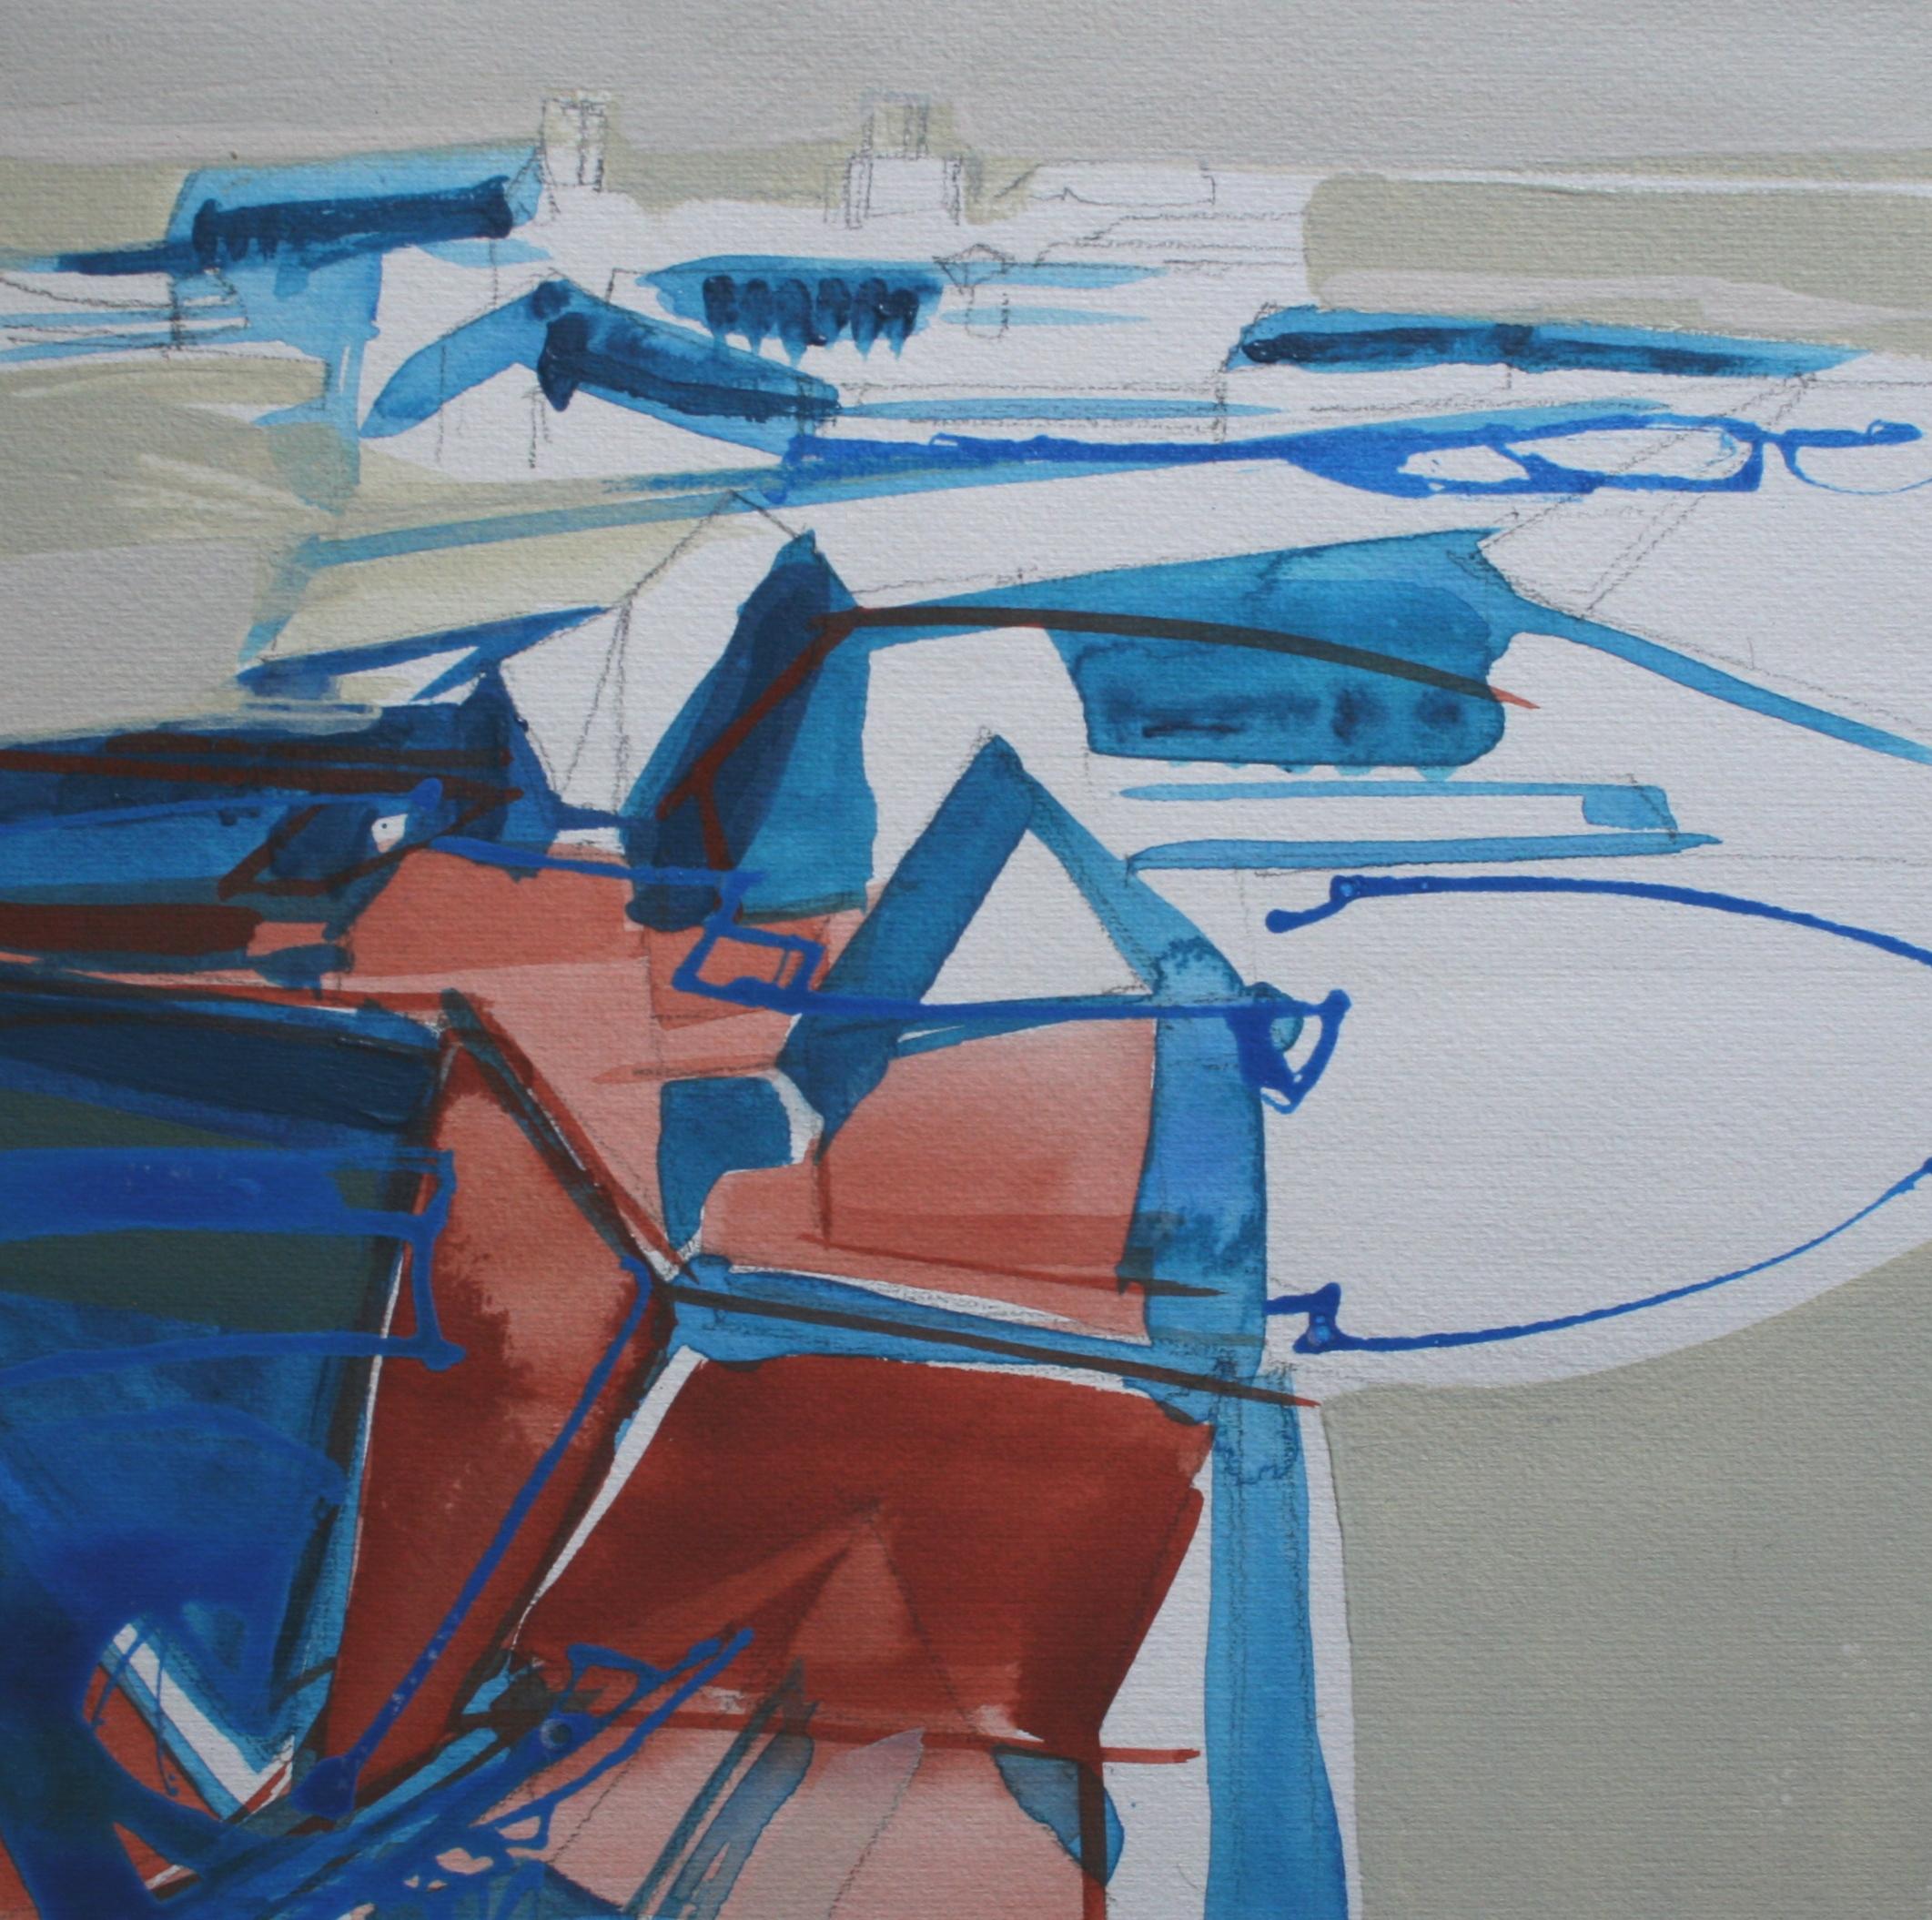 digbeth study, acrylic on paper, 25 x 25cm, 2001 Sold